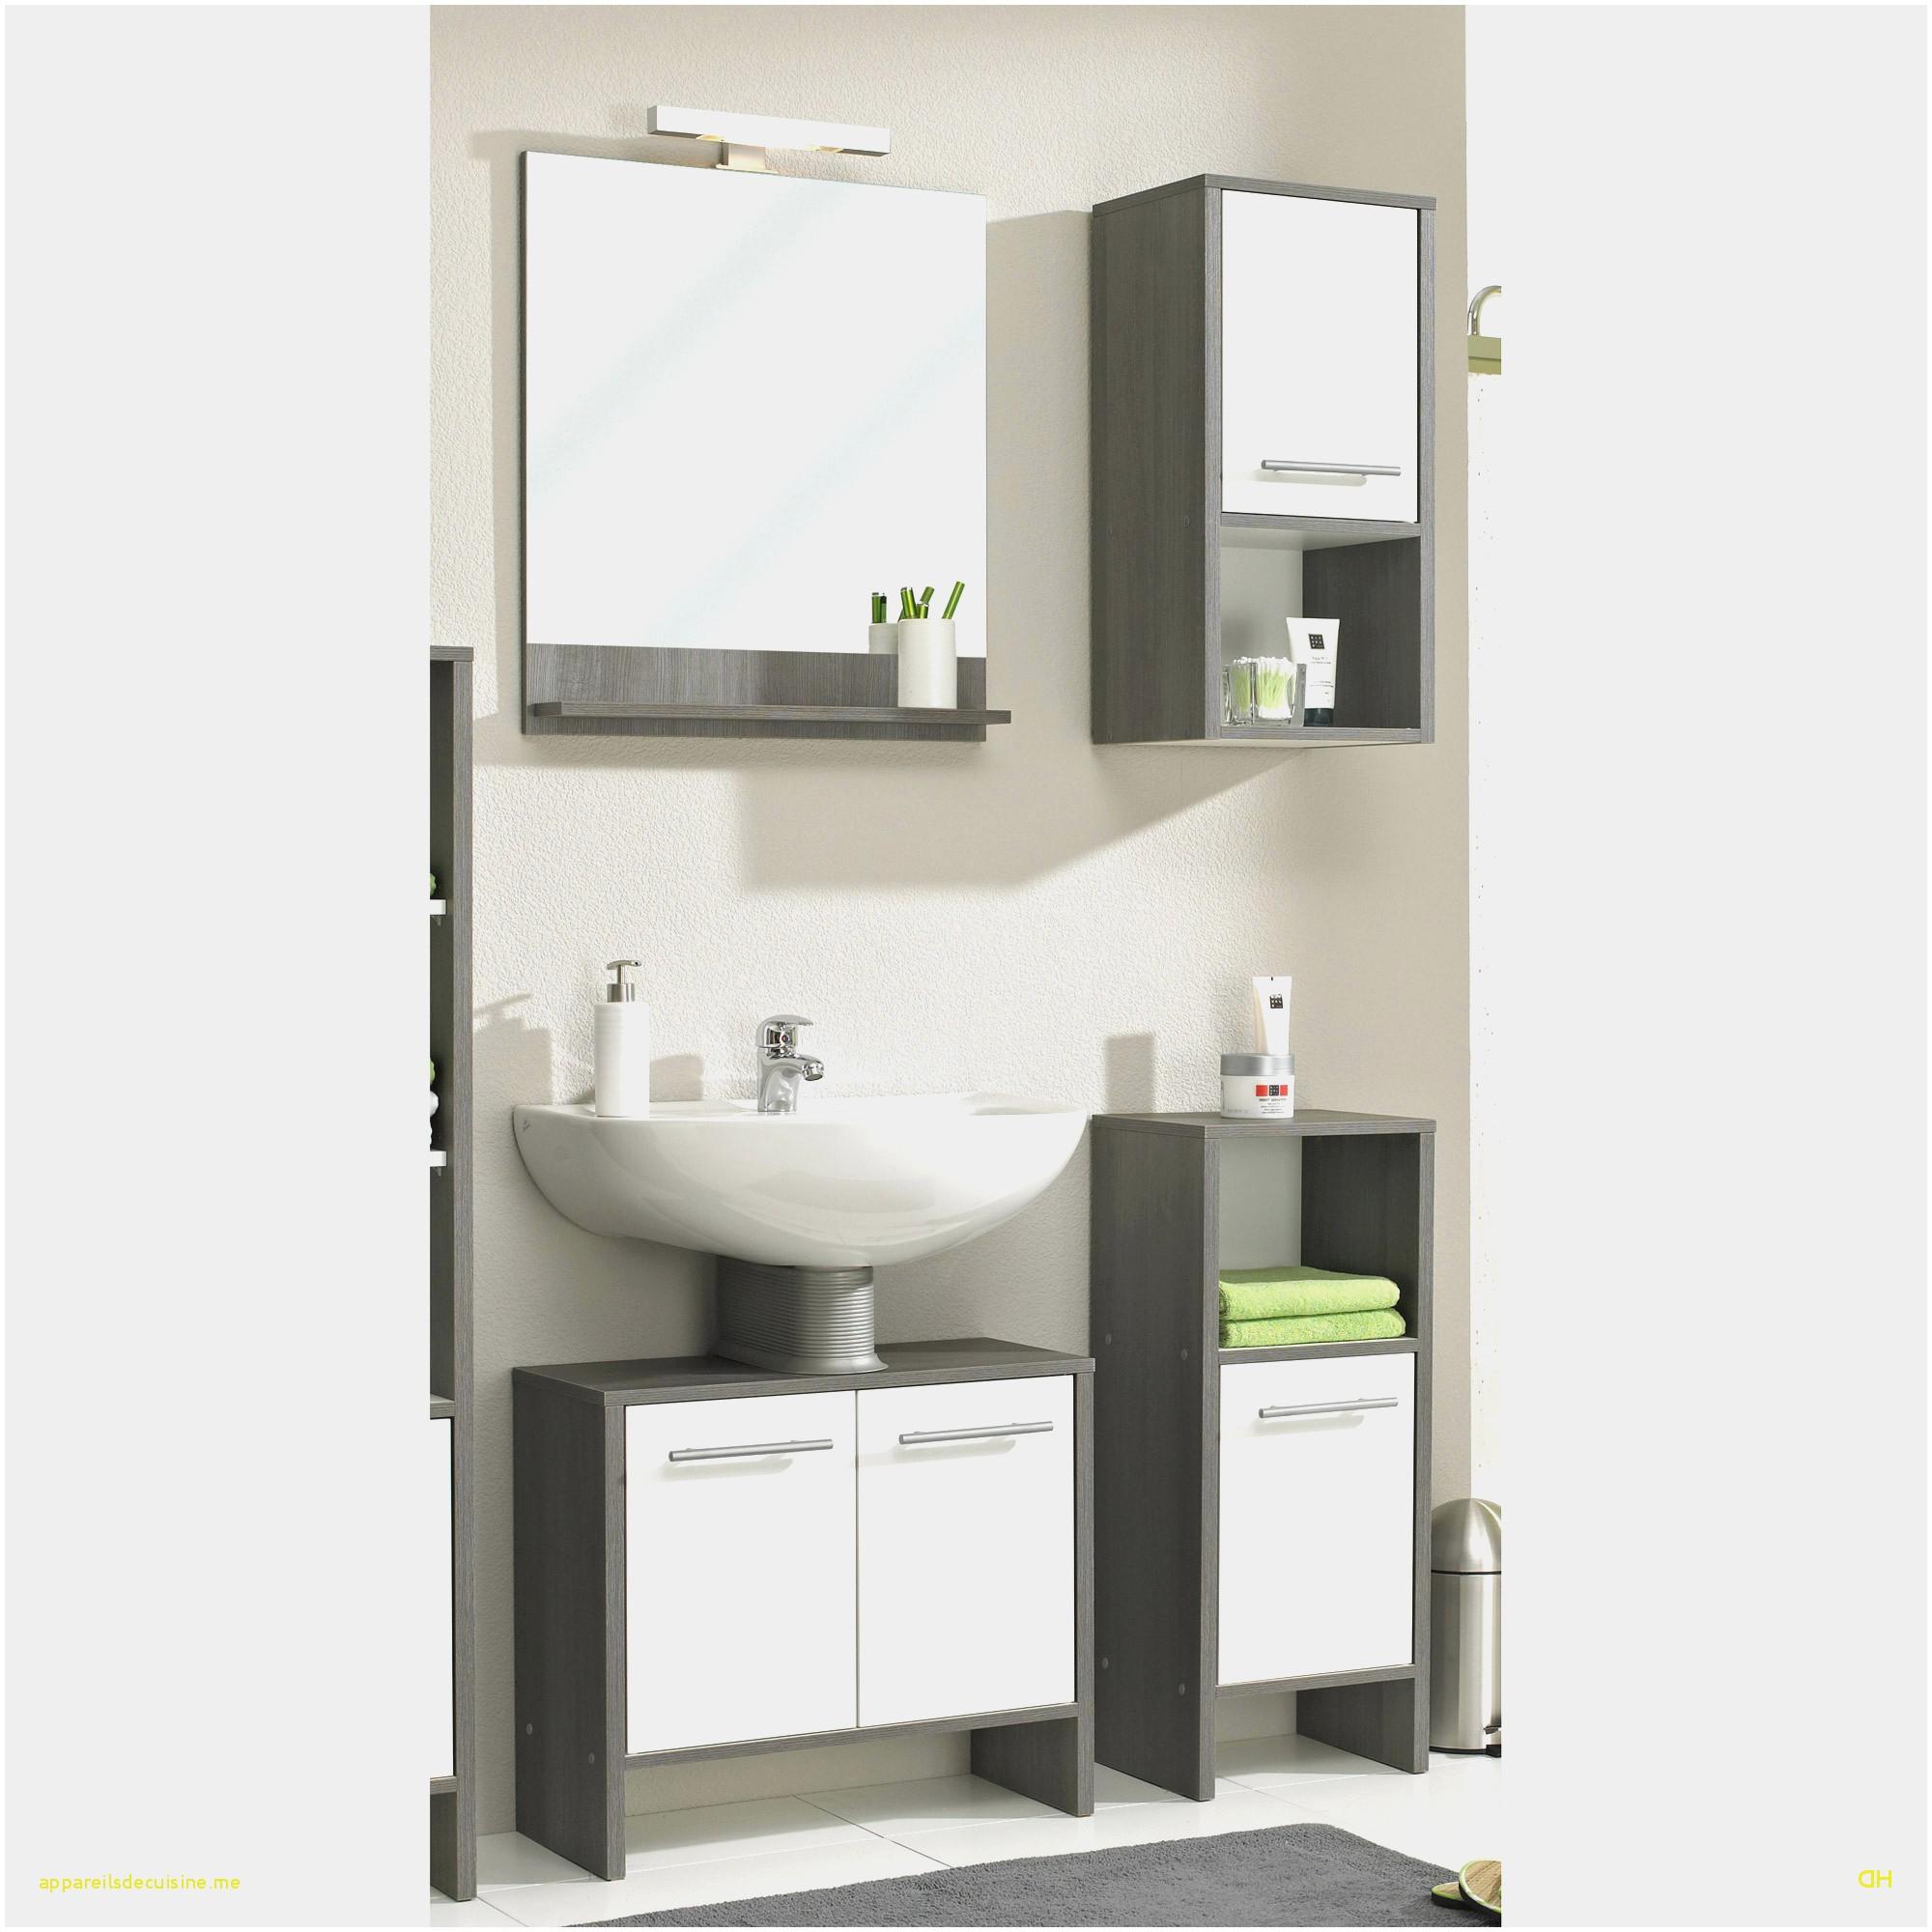 Lavabo Salle De Bain Ikea Luxe Image 10 Nouveau Meuble toilette Ikea Anciendemutu